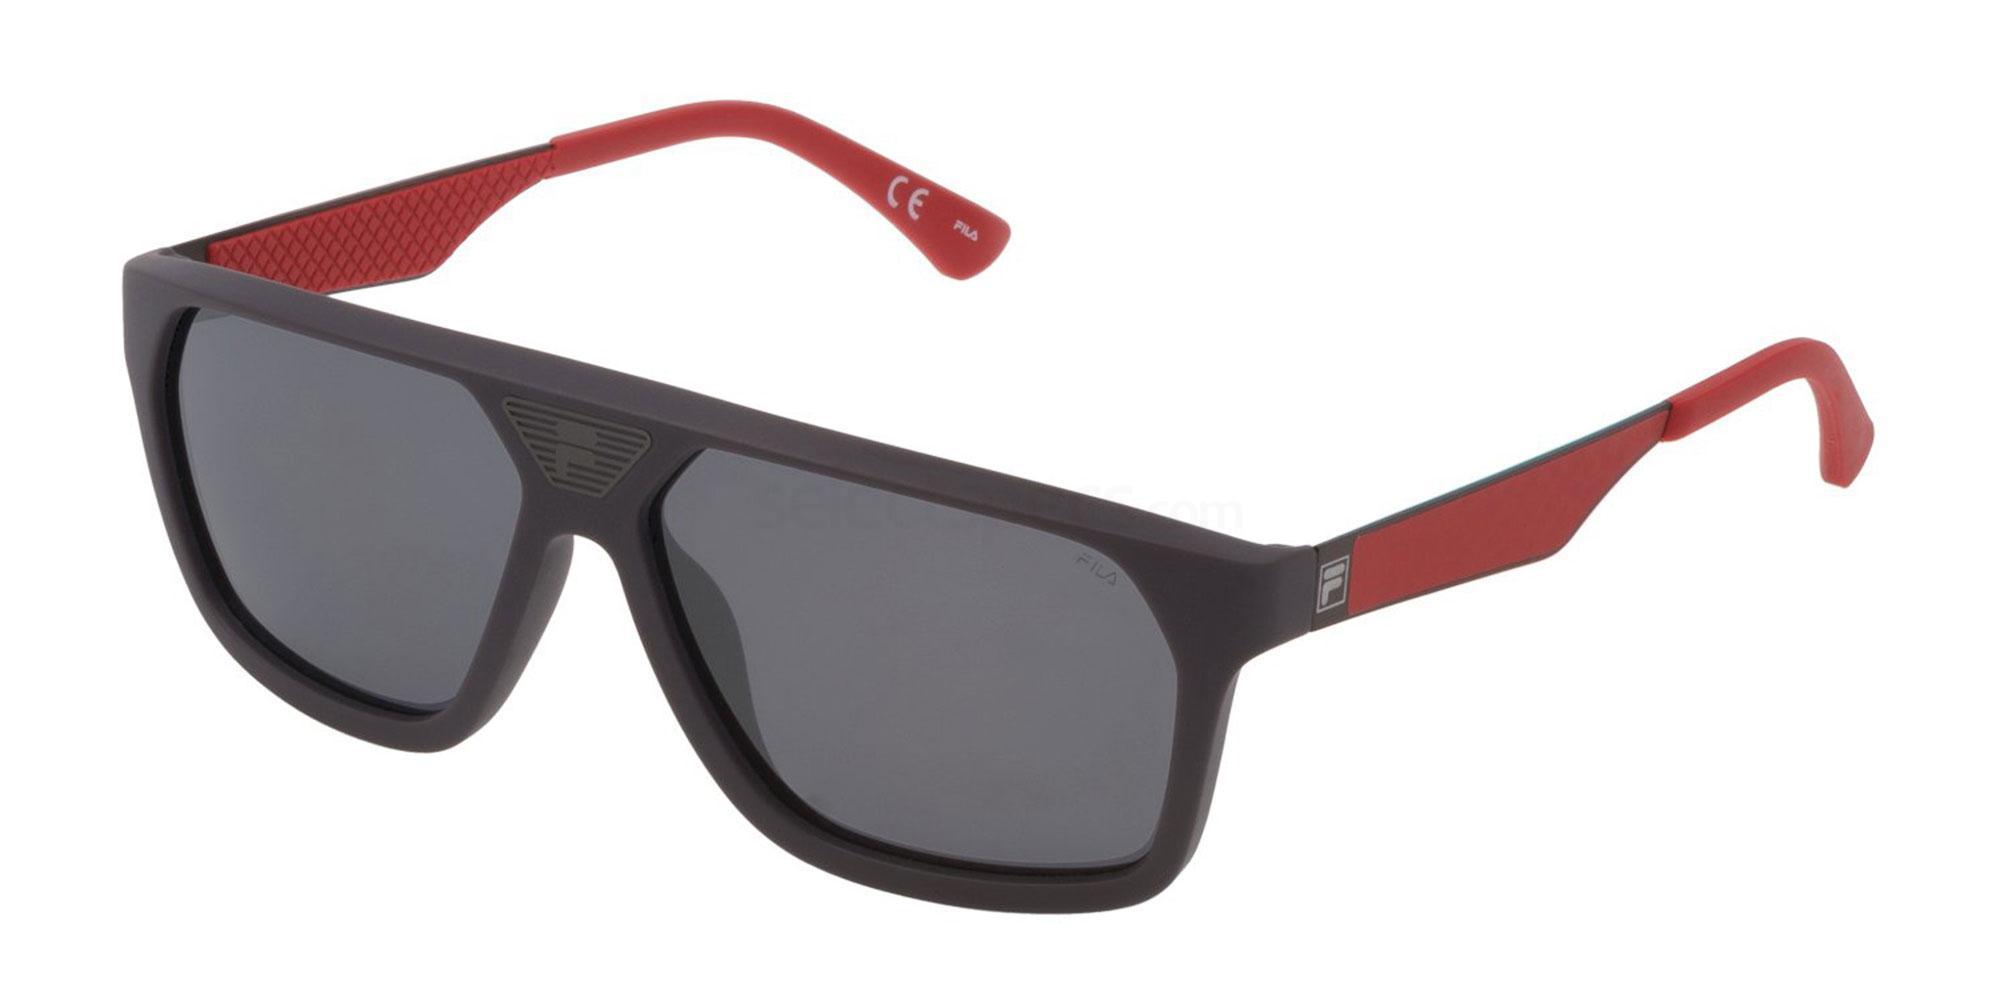 R43P SF8496 Sunglasses, Fila